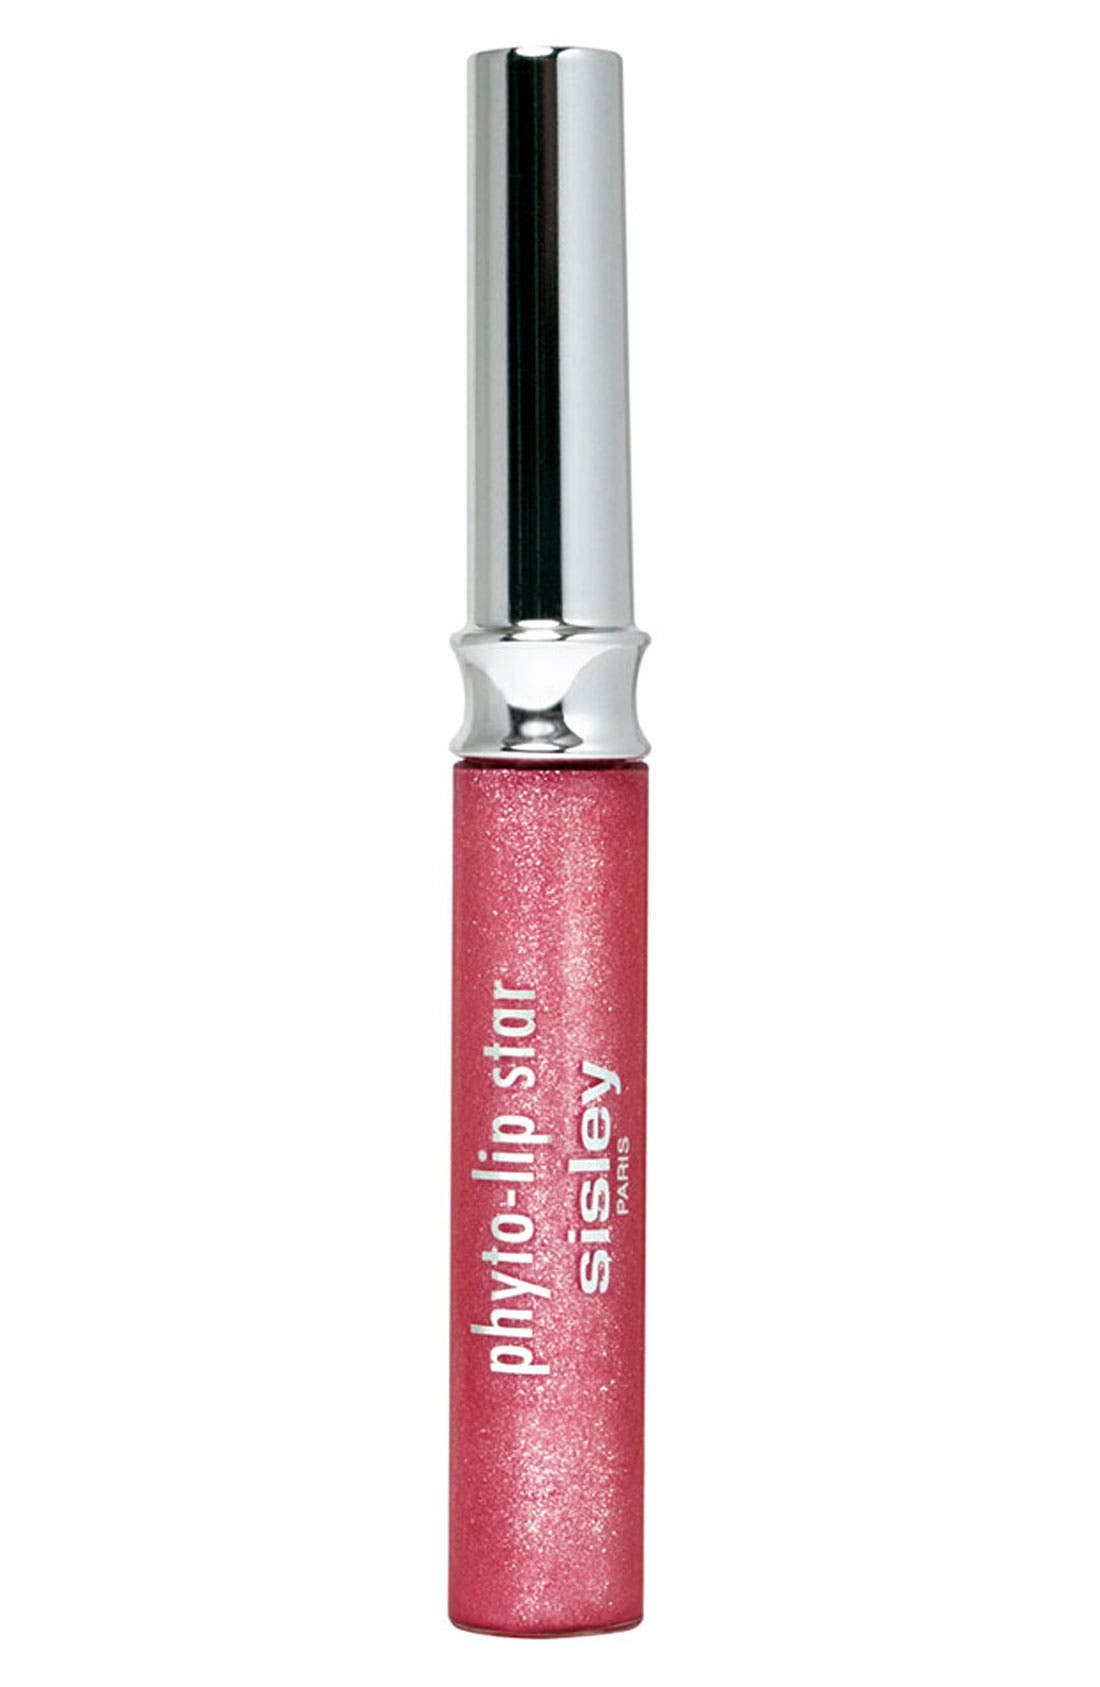 Sisley 'Phyto-Lip Star' Lip Color